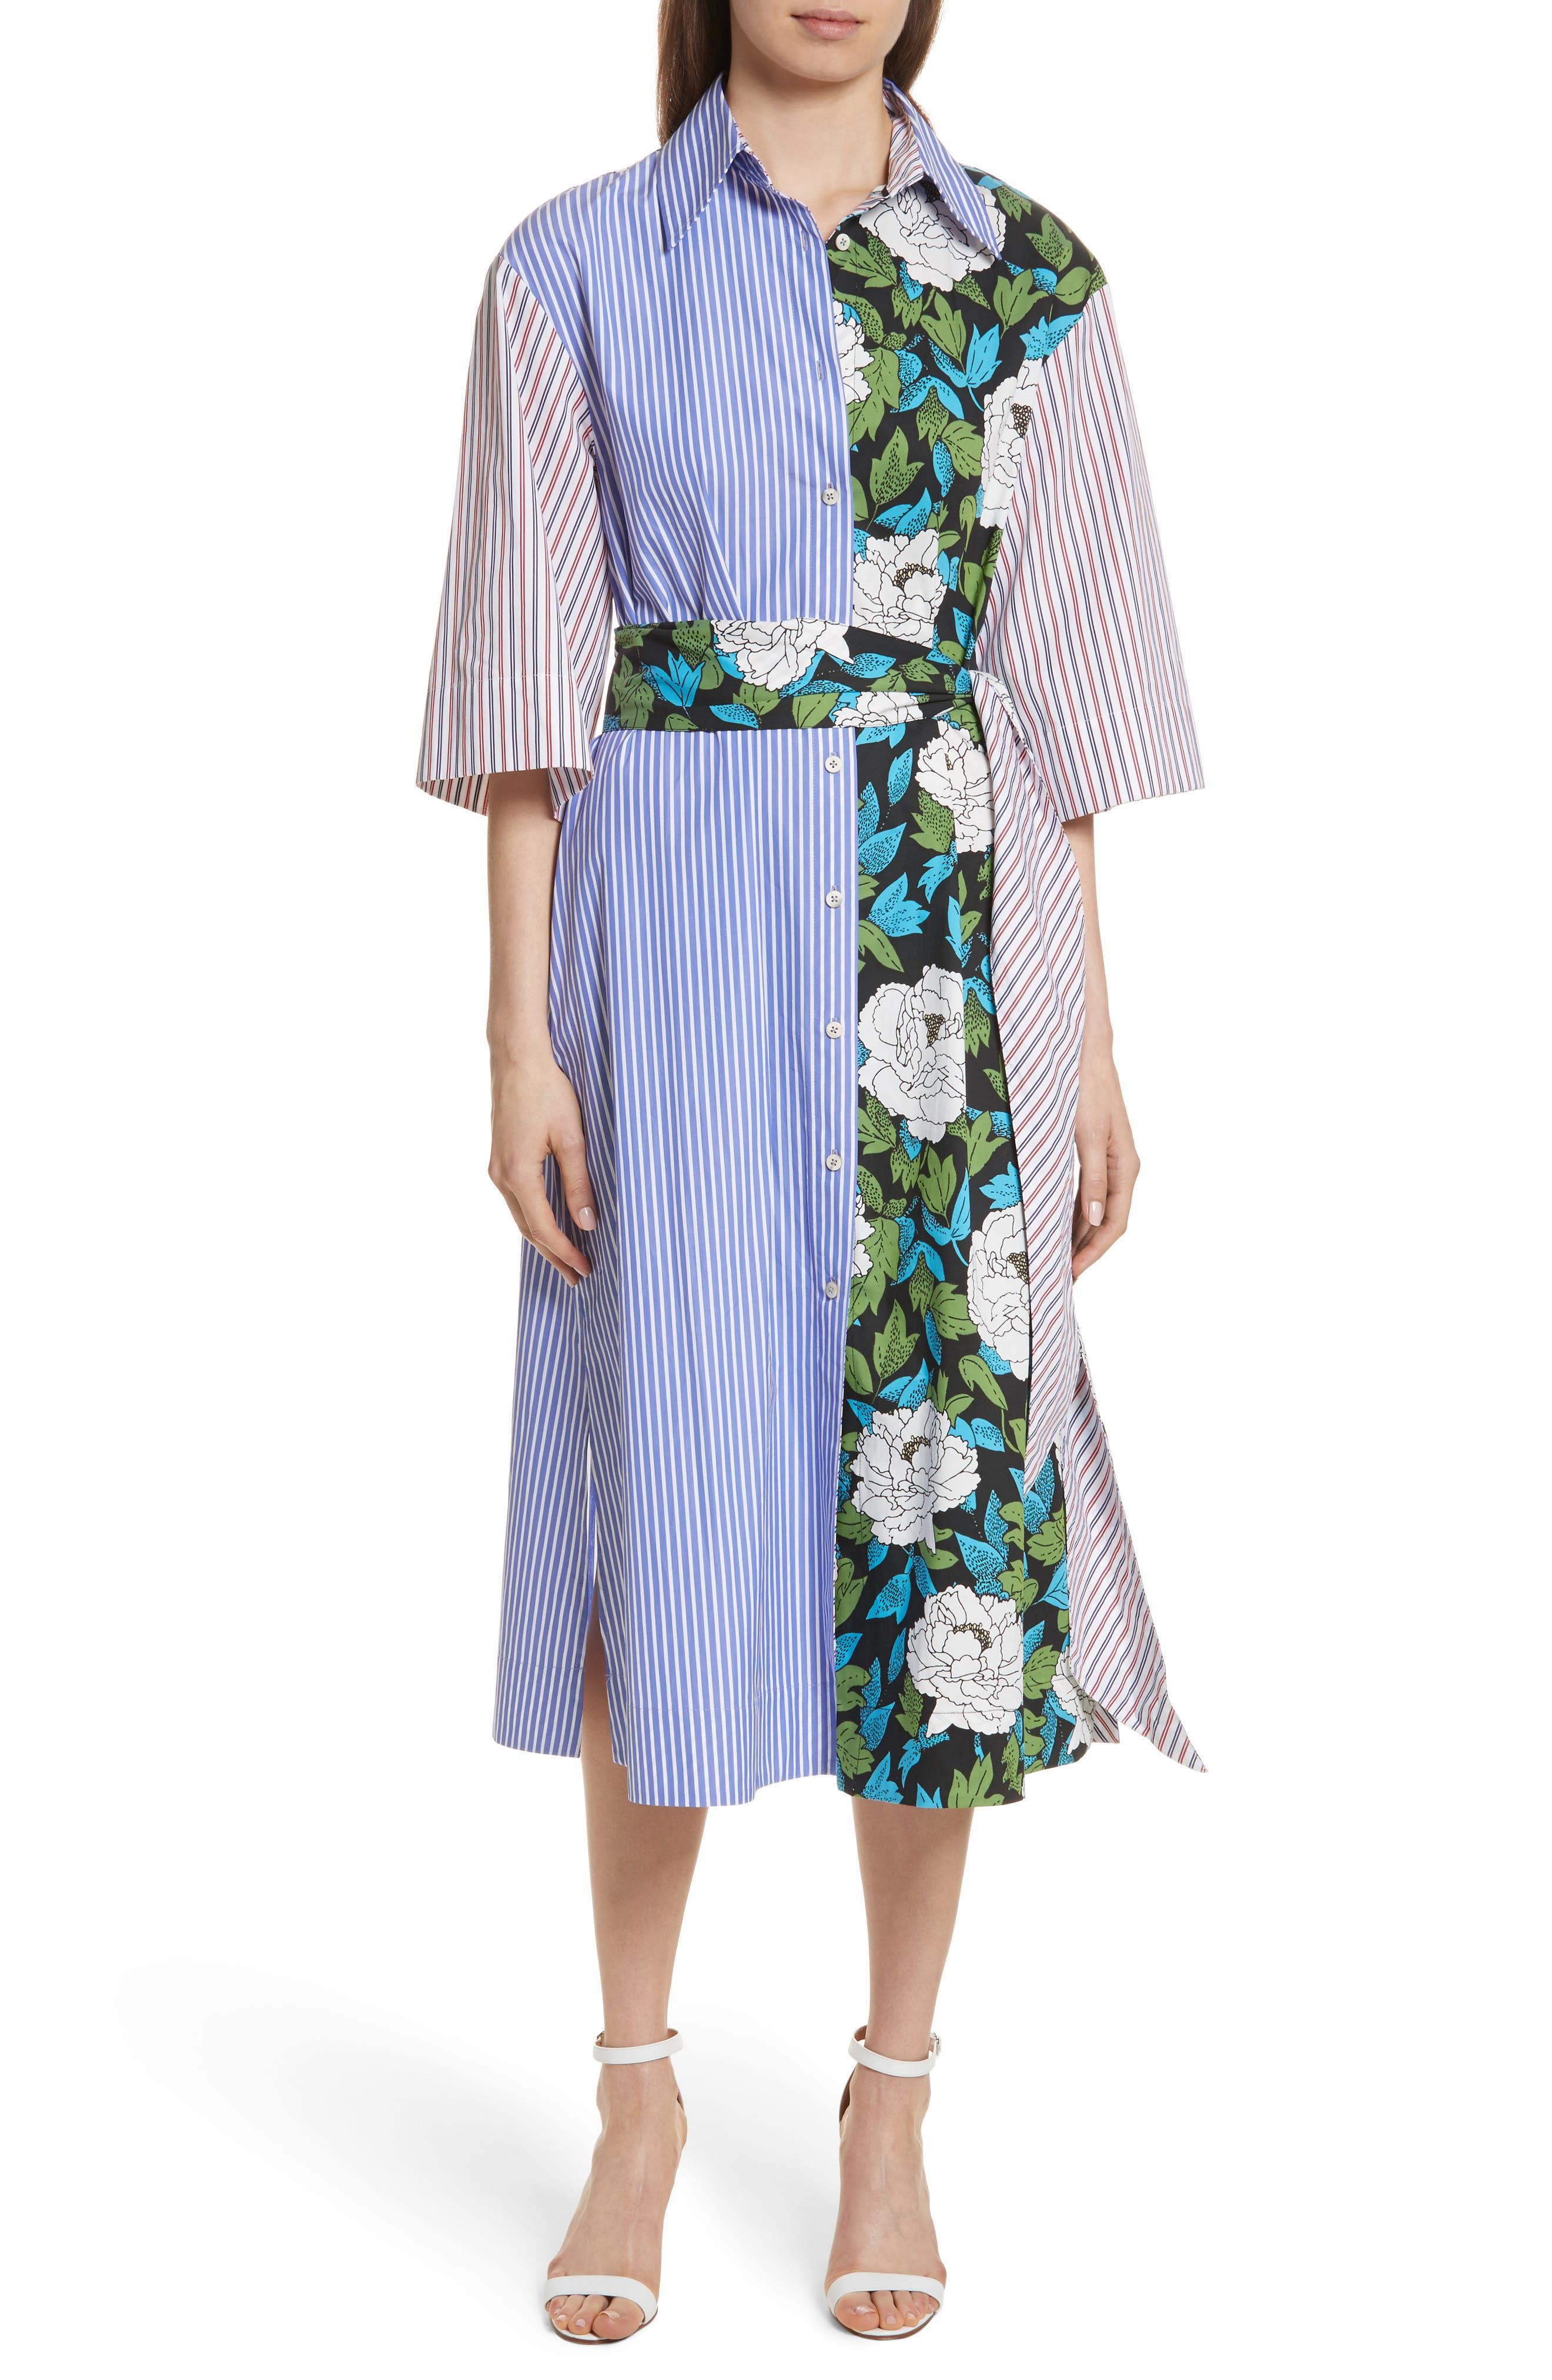 Diane von Furstenberg Mixed Print Cotton Shirtdress,                             Main thumbnail 1, color,